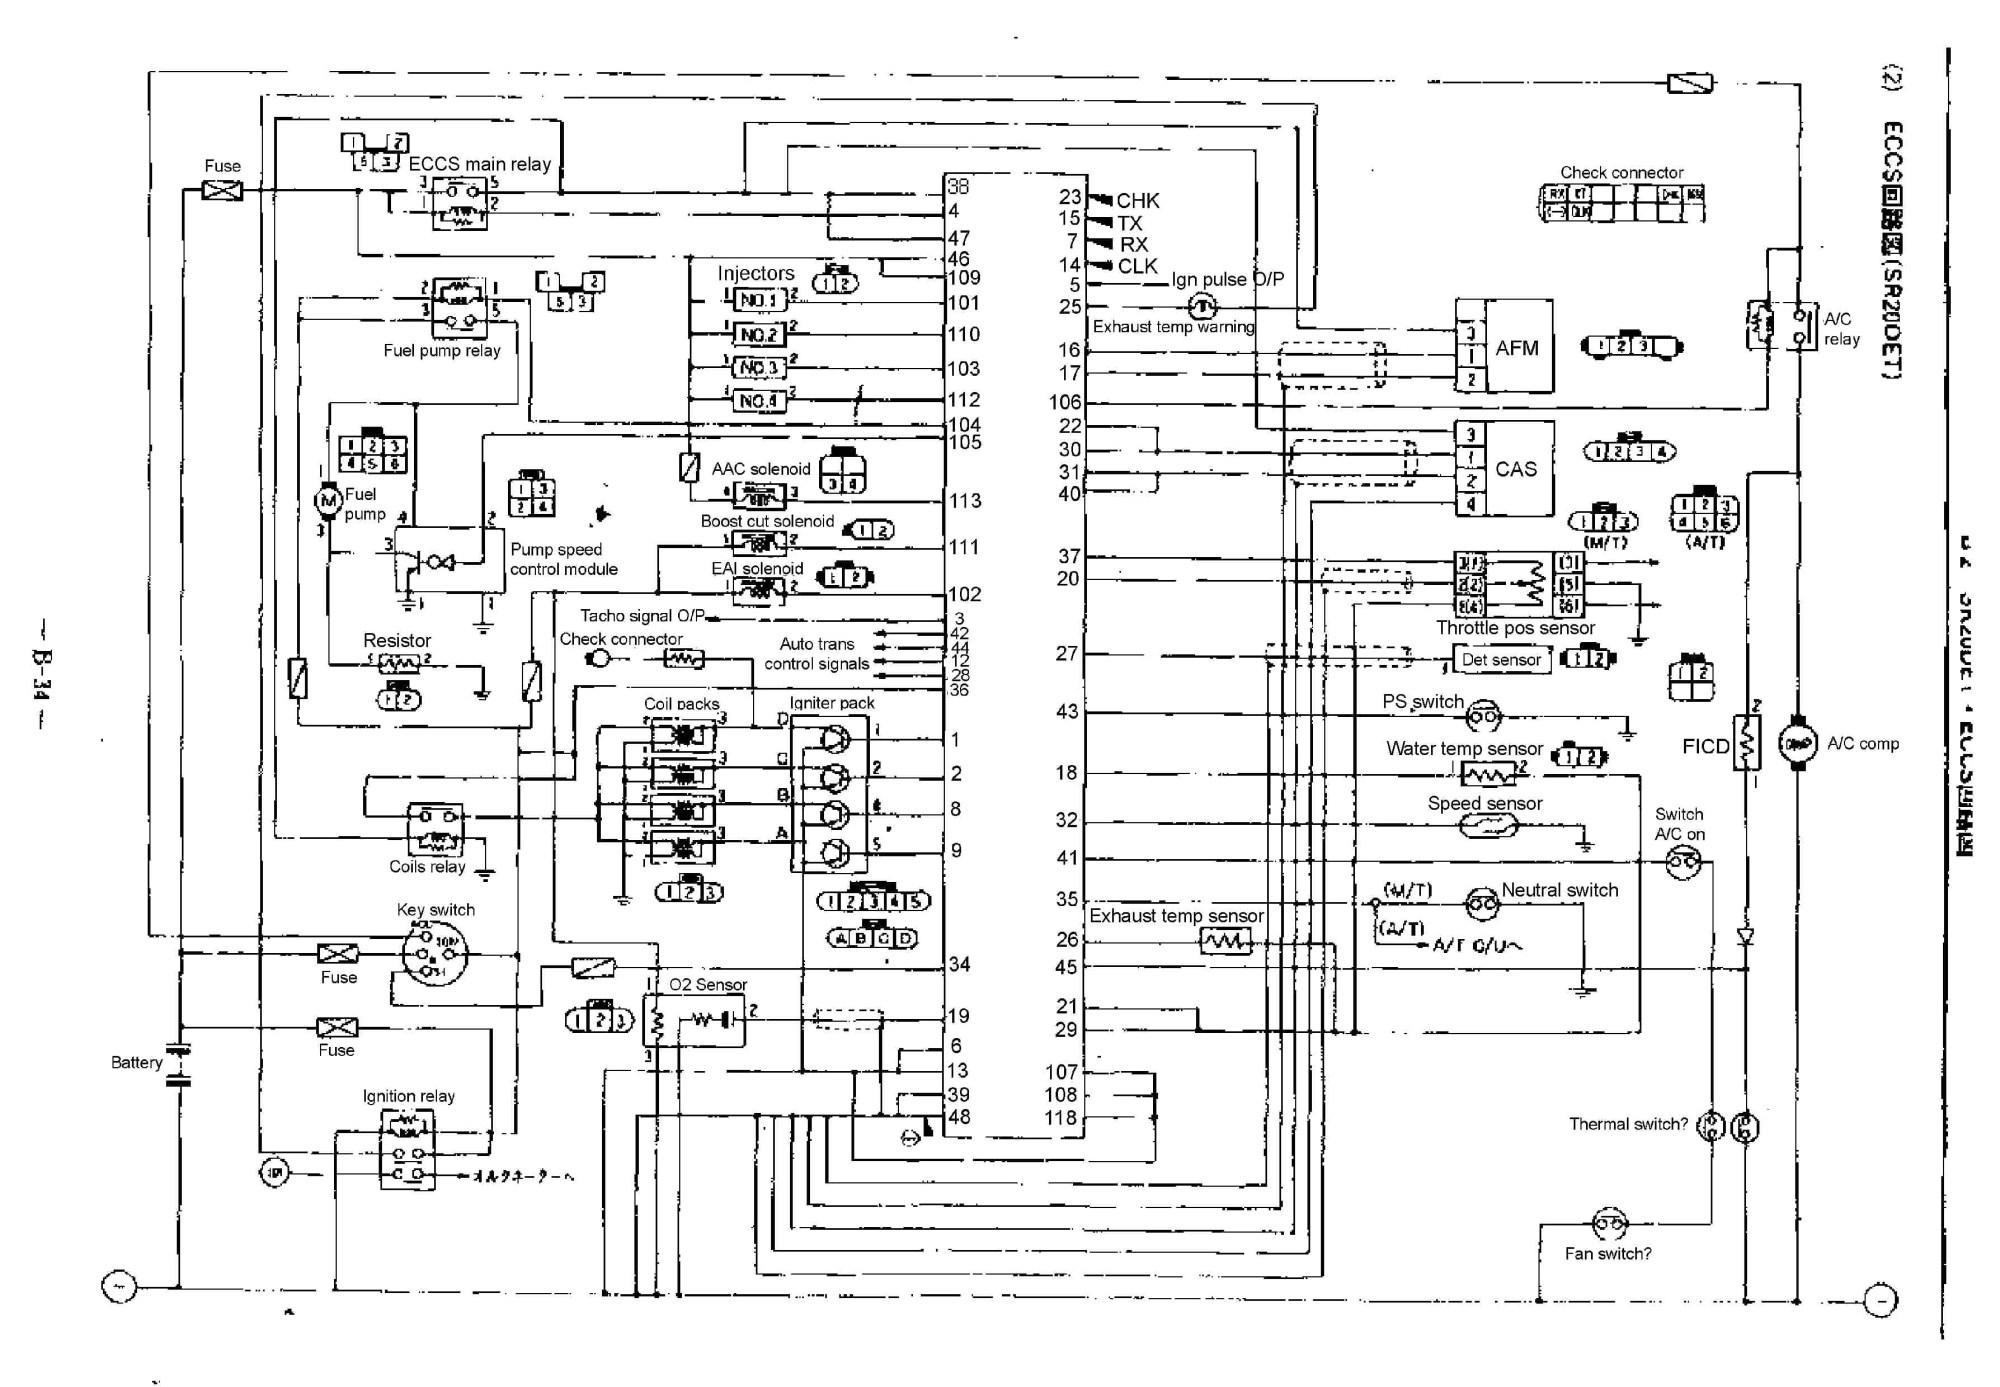 hight resolution of 2005 nissan altima engine diagram nissan wiring diagrams of 2005 nissan altima engine diagram nissan sentra